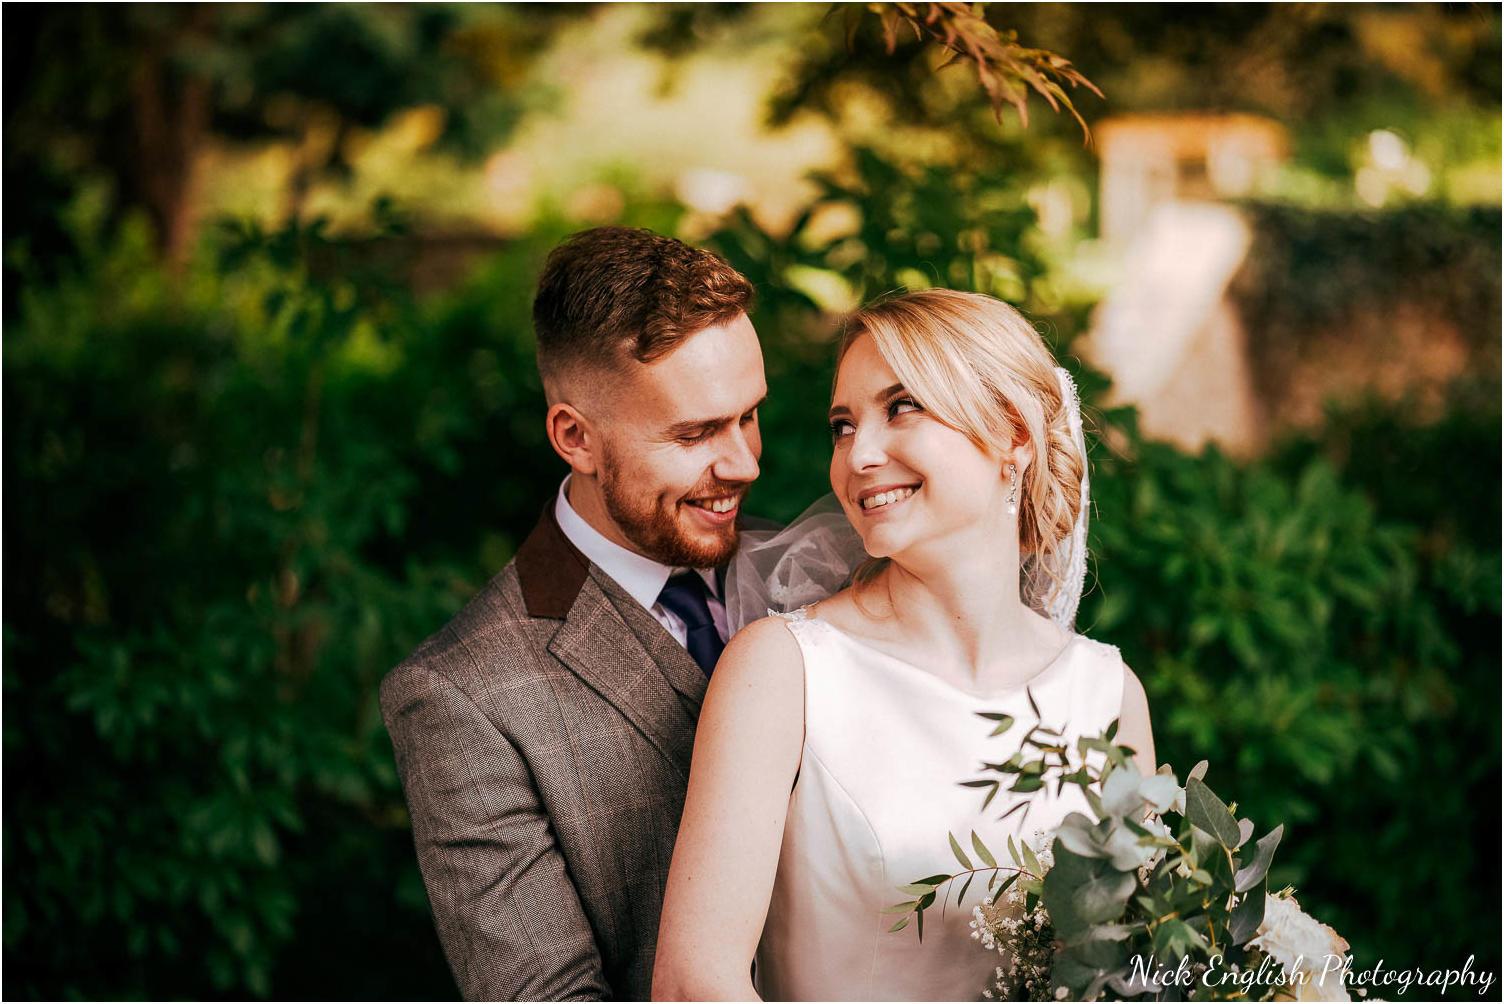 Eaves_Hall_Outdoor_Wedding_Photograph-57.jpg